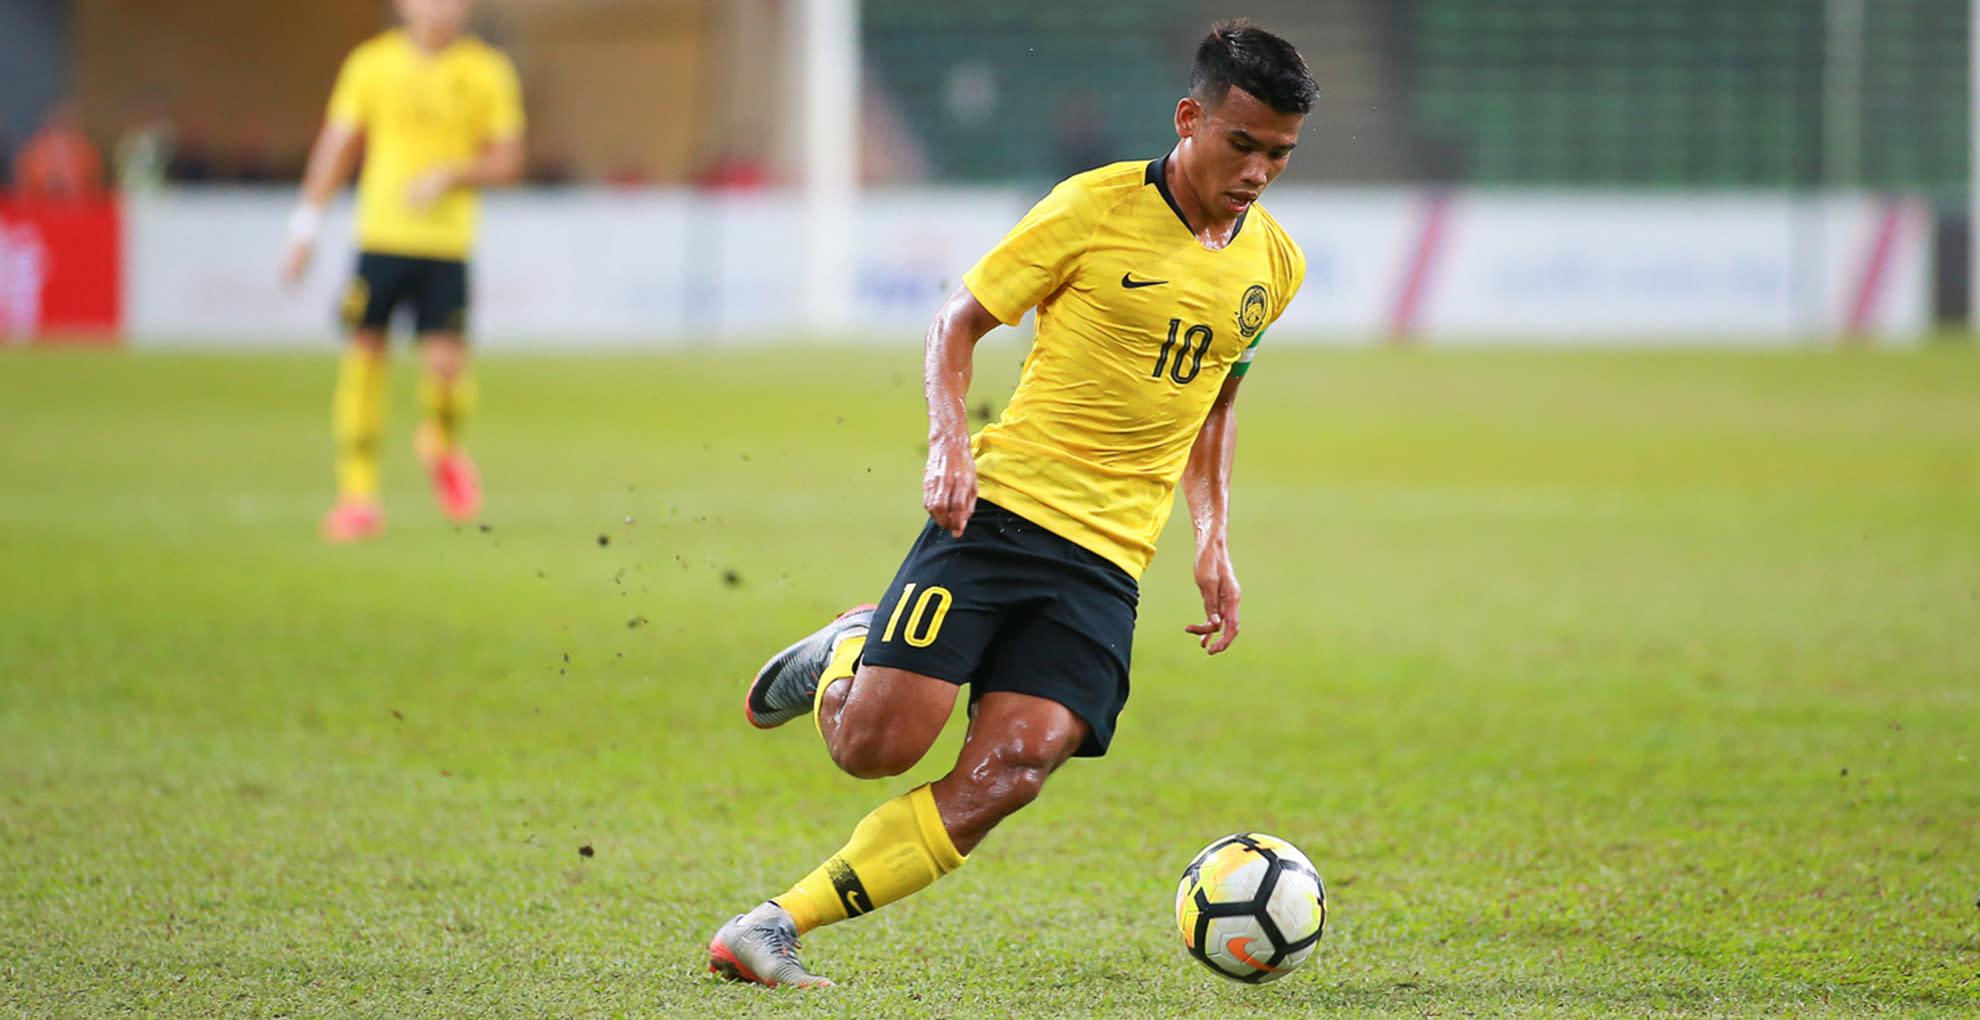 Malaysia slogged to a narrow win over Laos